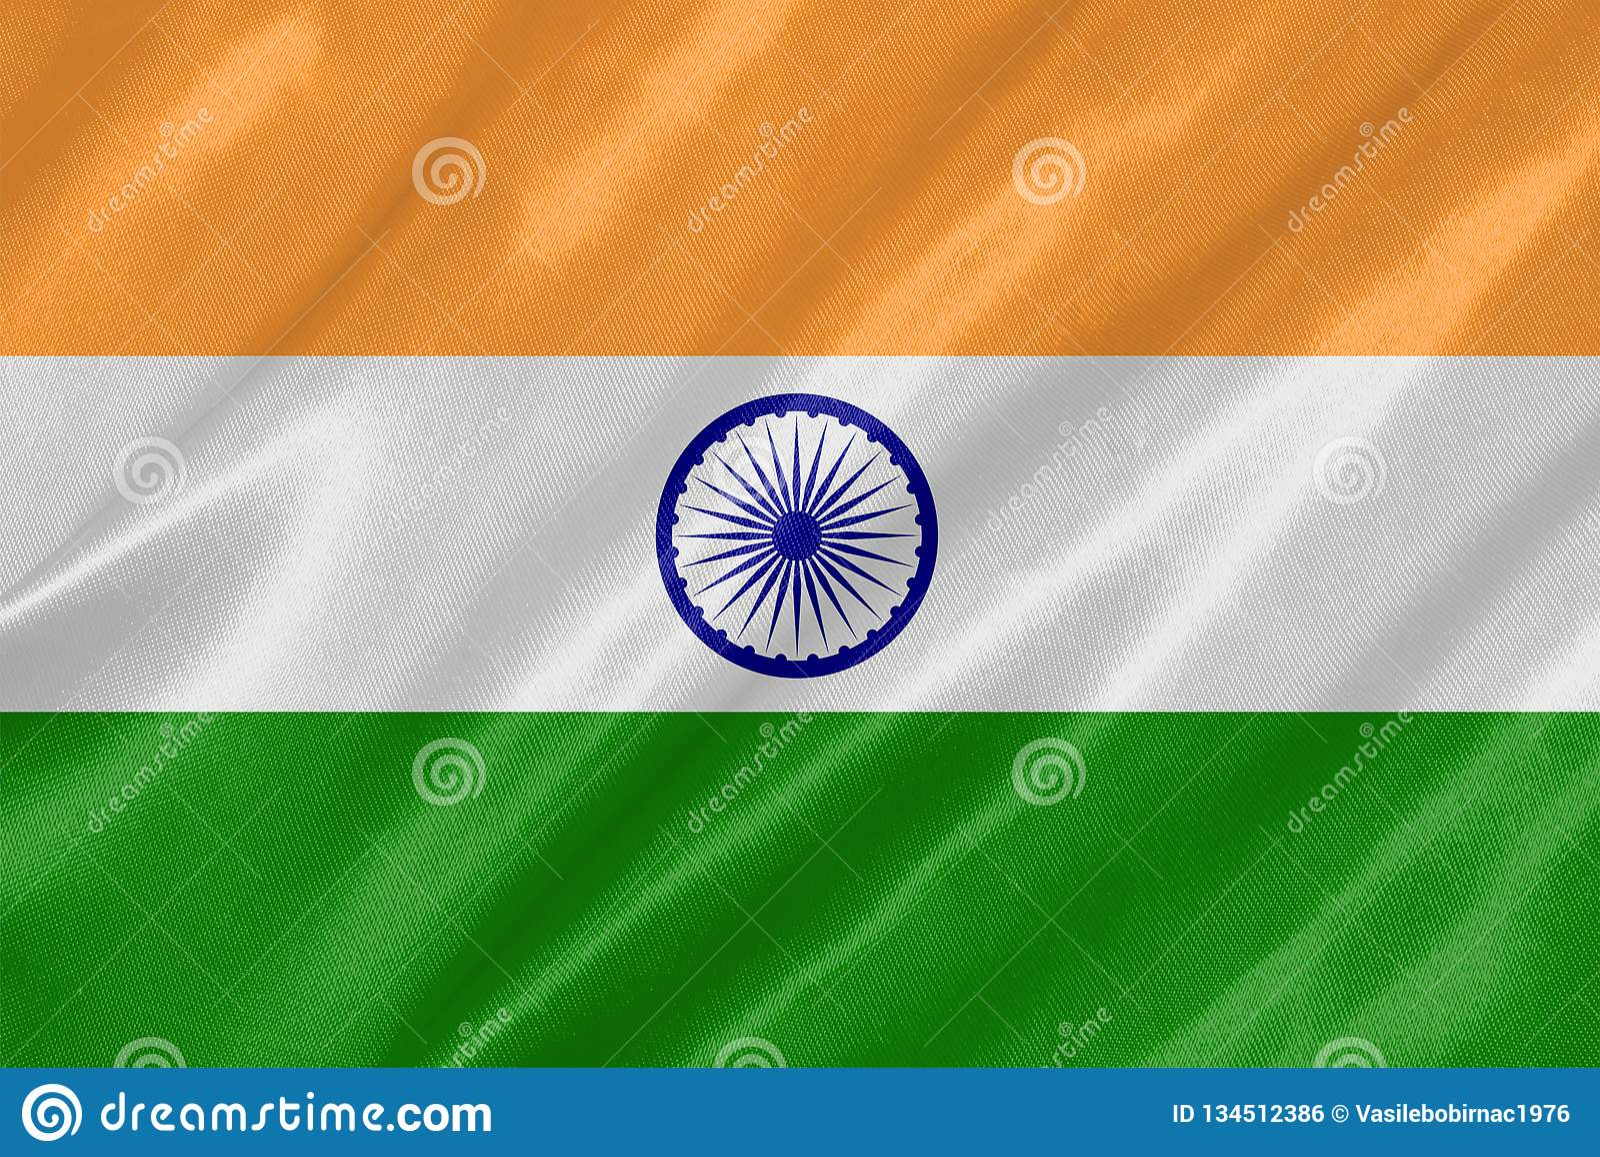 Die Staatsflagge von Indien